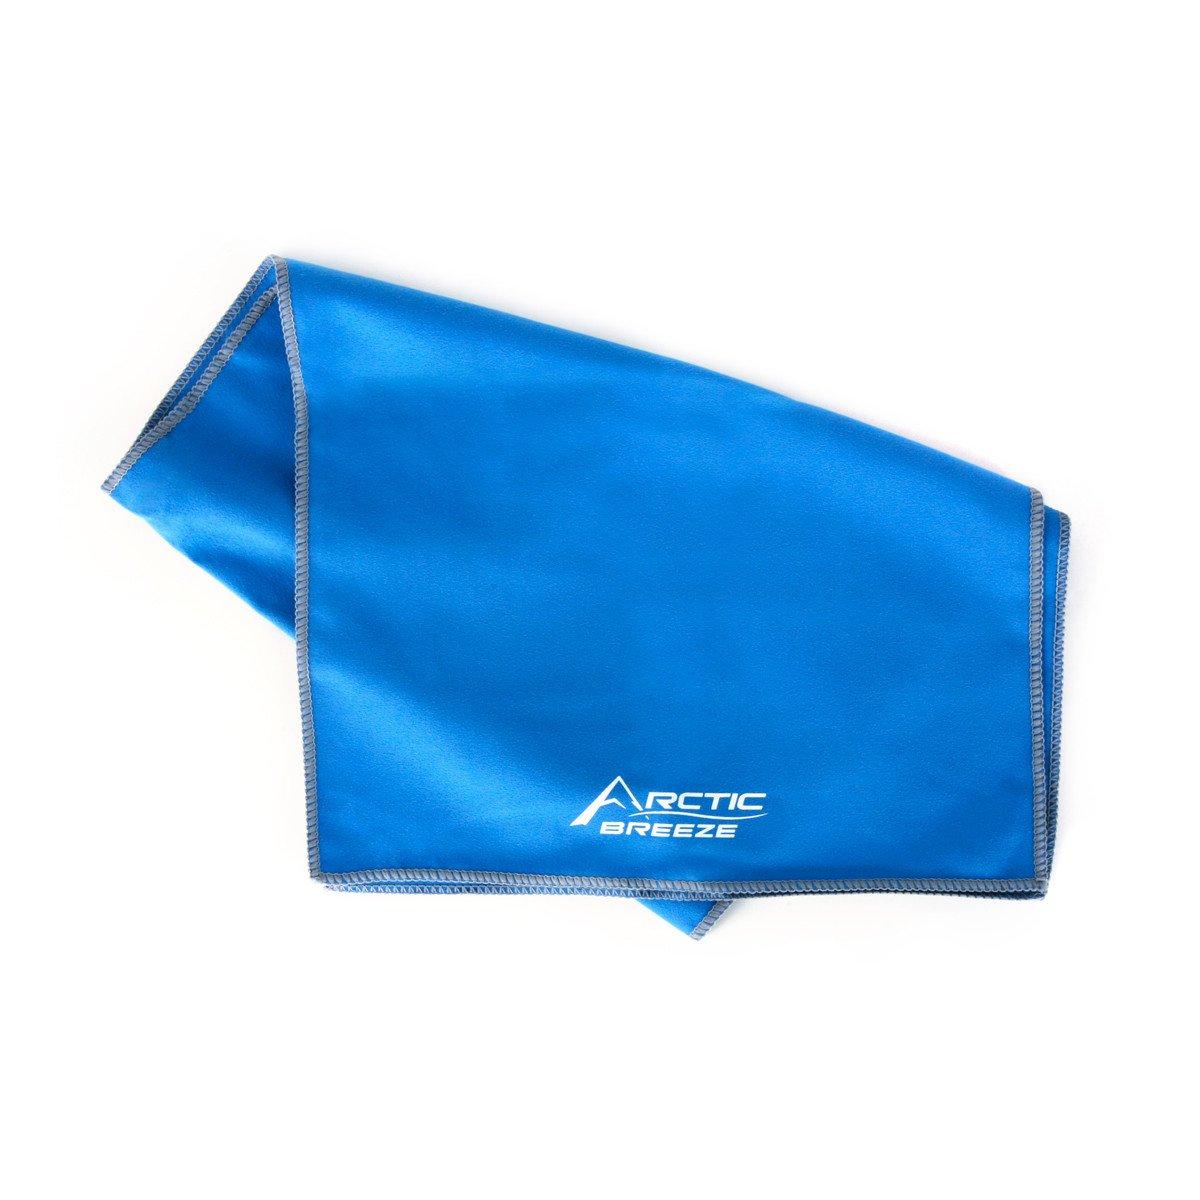 Affinity Arctic Breeze Cooling Towel